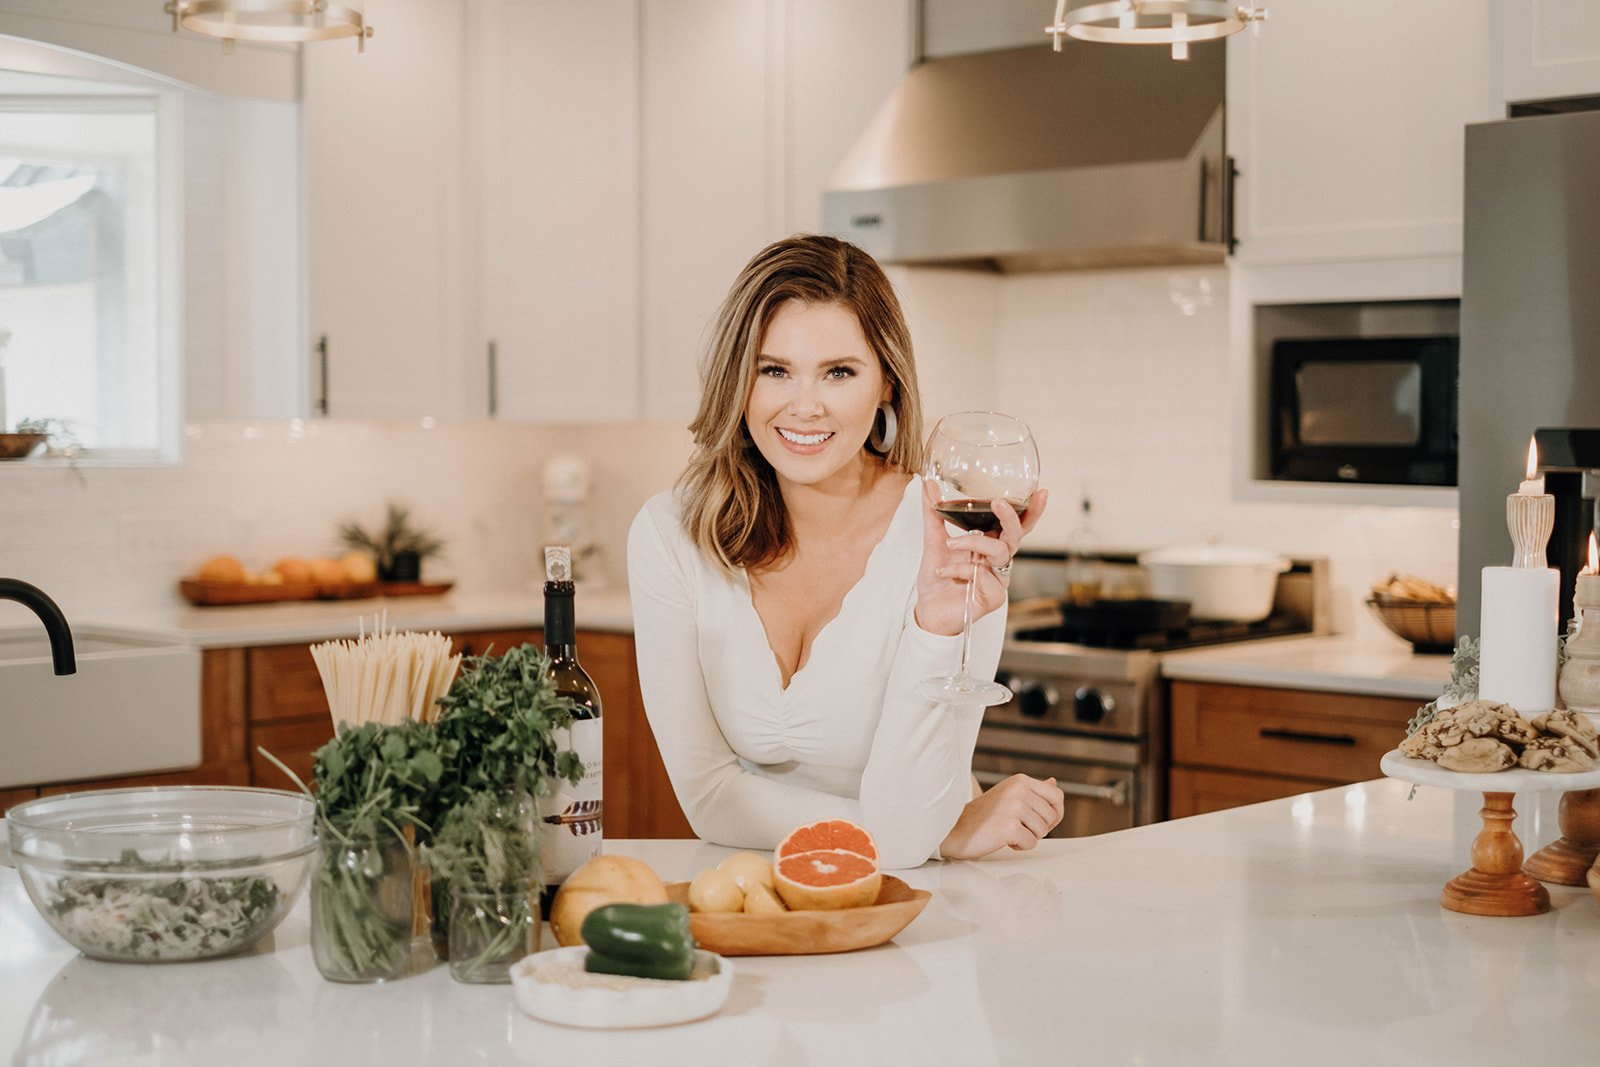 Sara ayes holding wine in a white kitchen with fresh ingredients around her